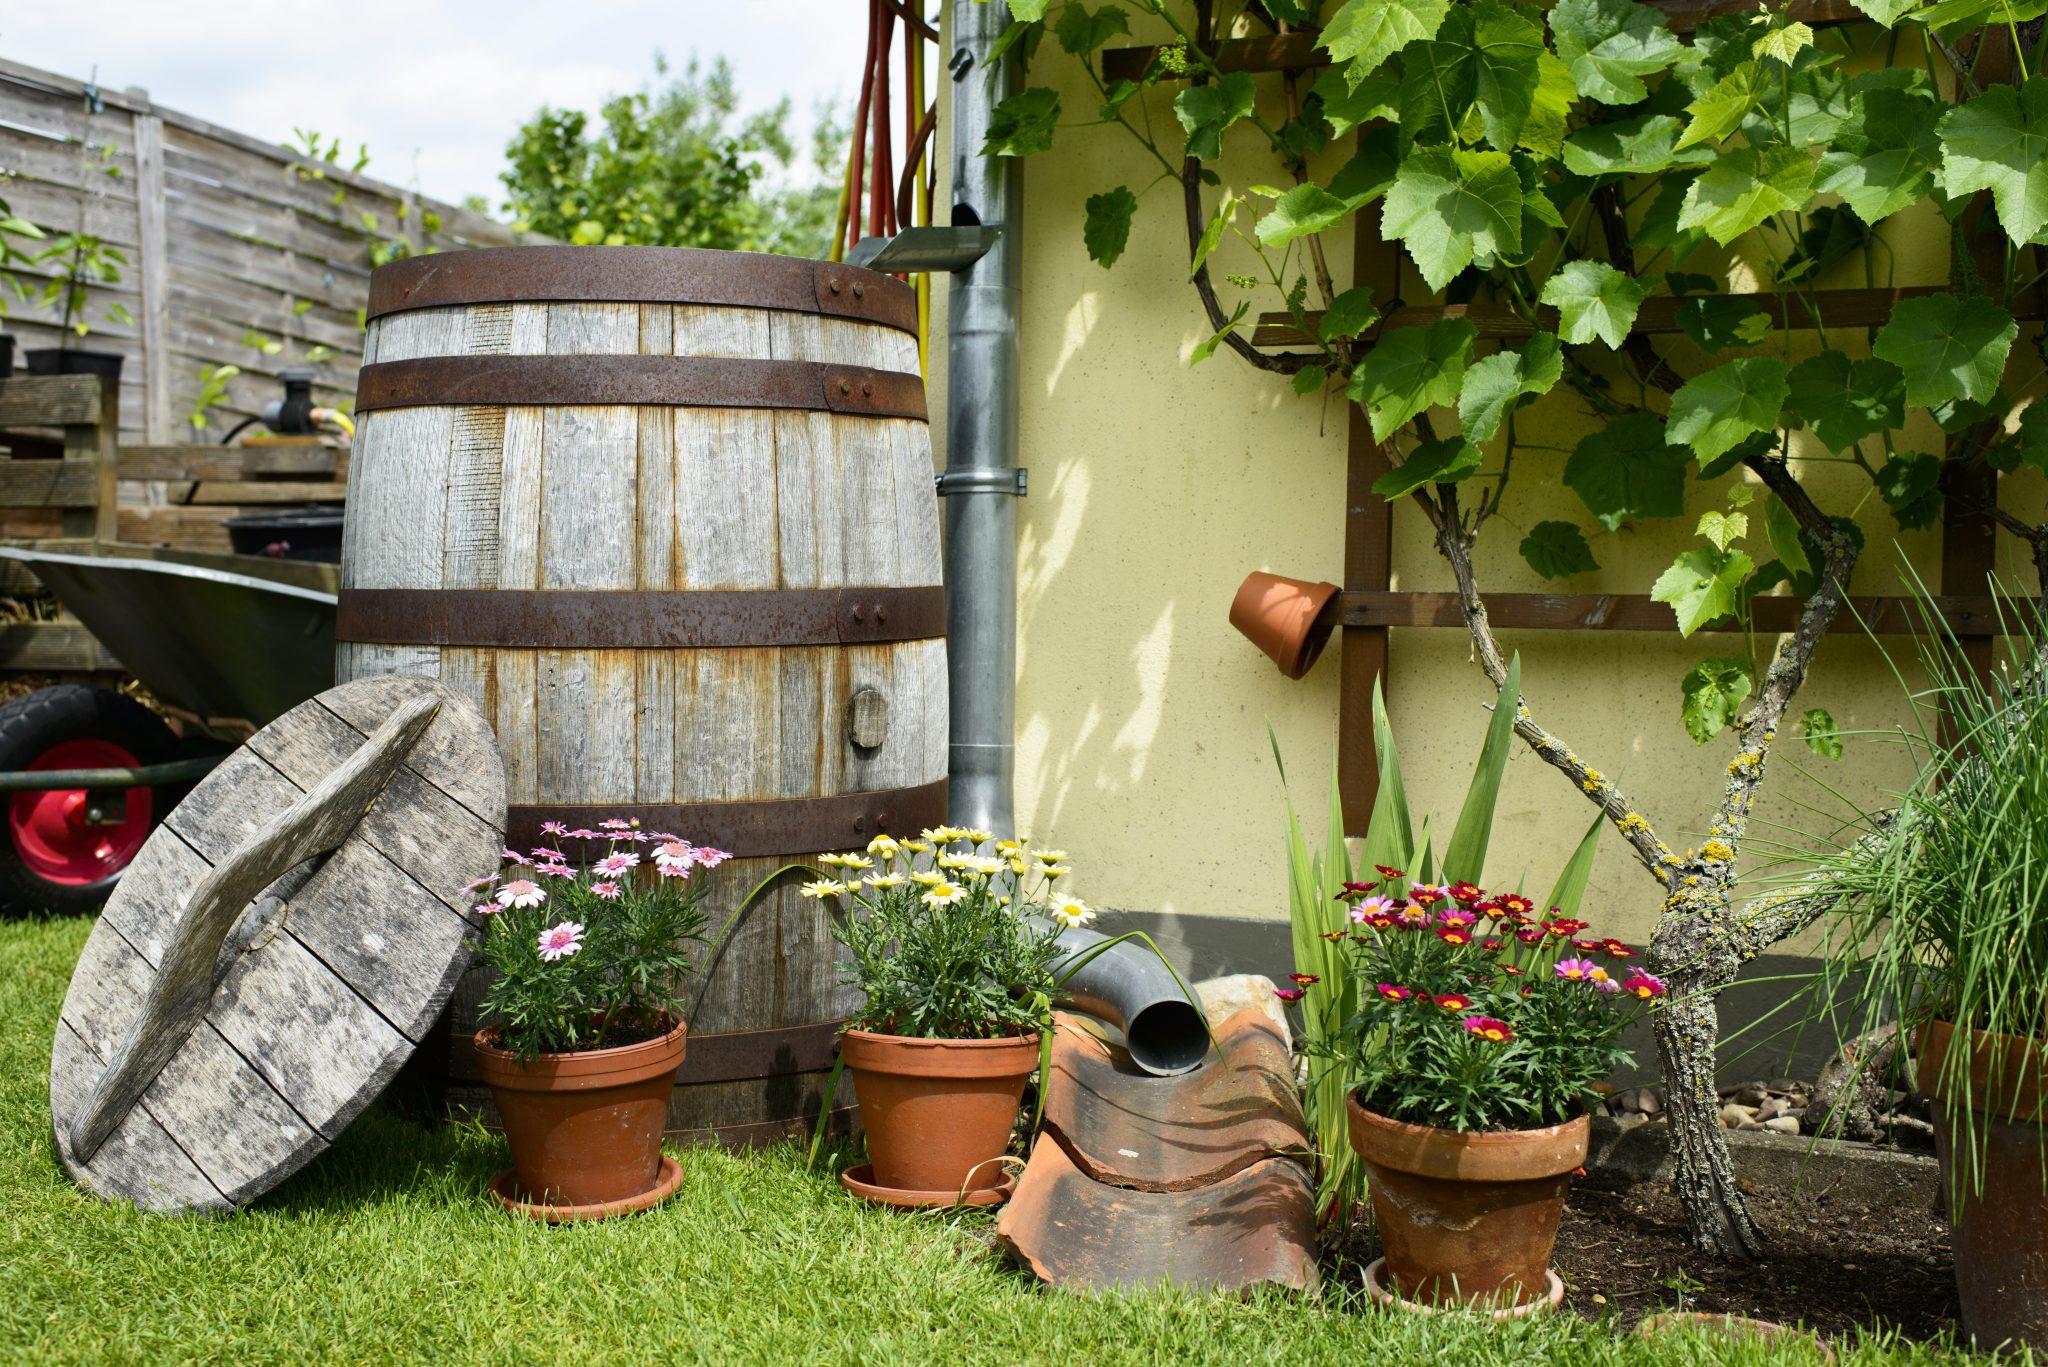 Wooden barrel for rainwater